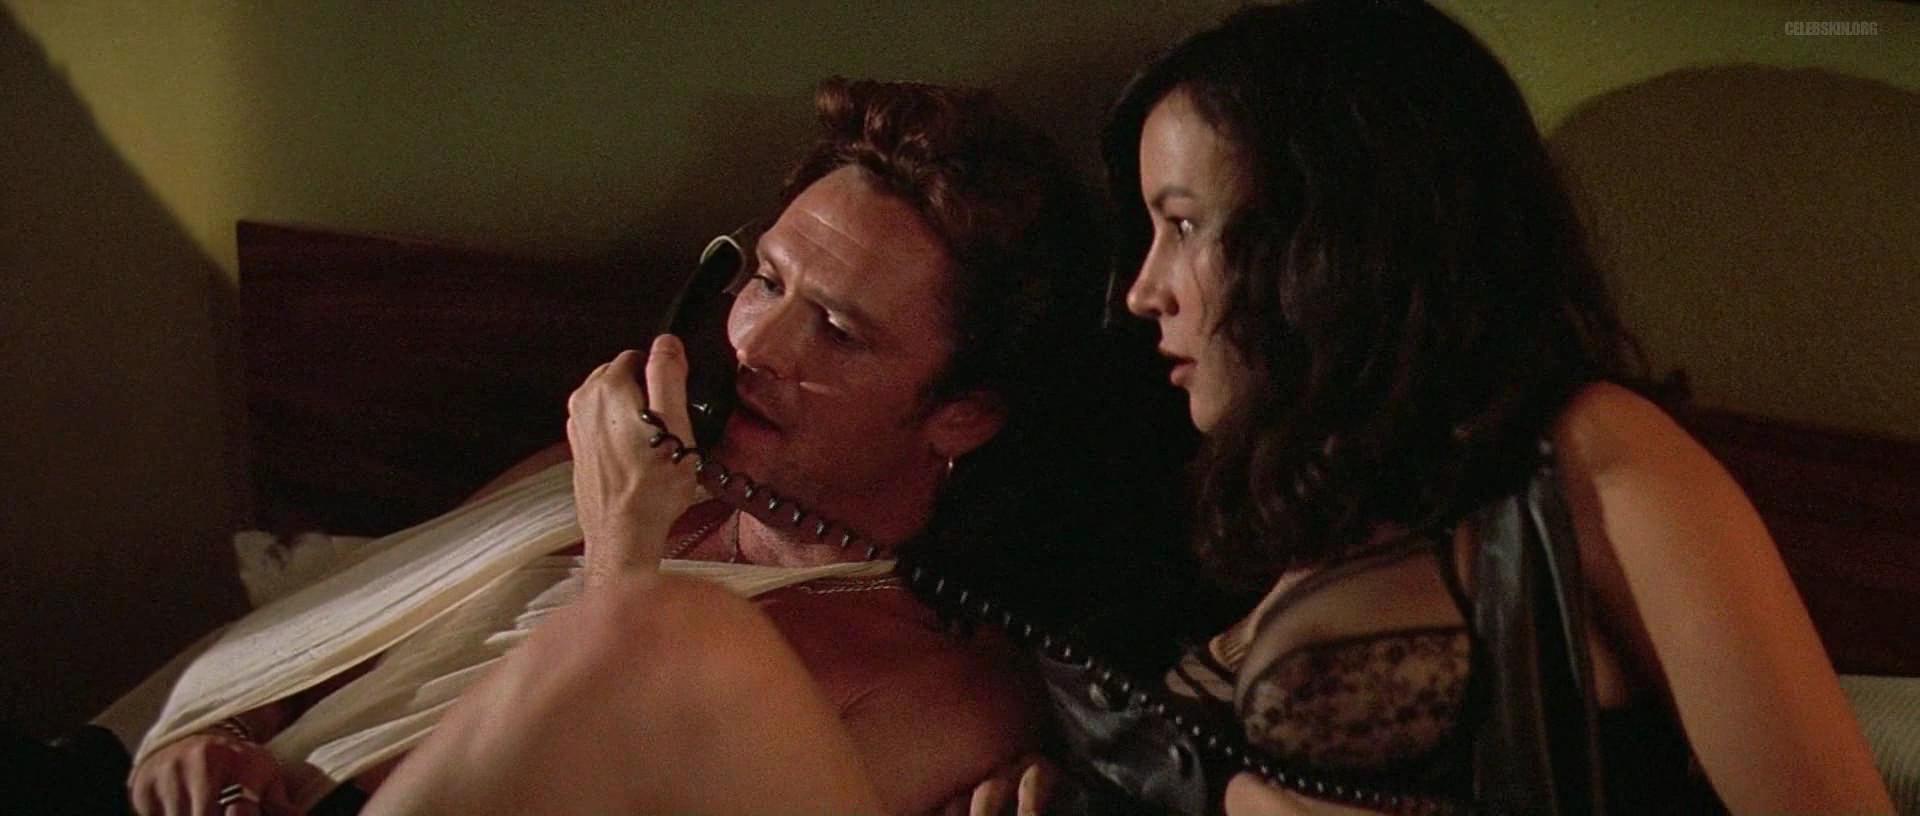 Jennifer Tilly The Getaway Sex Scene 41